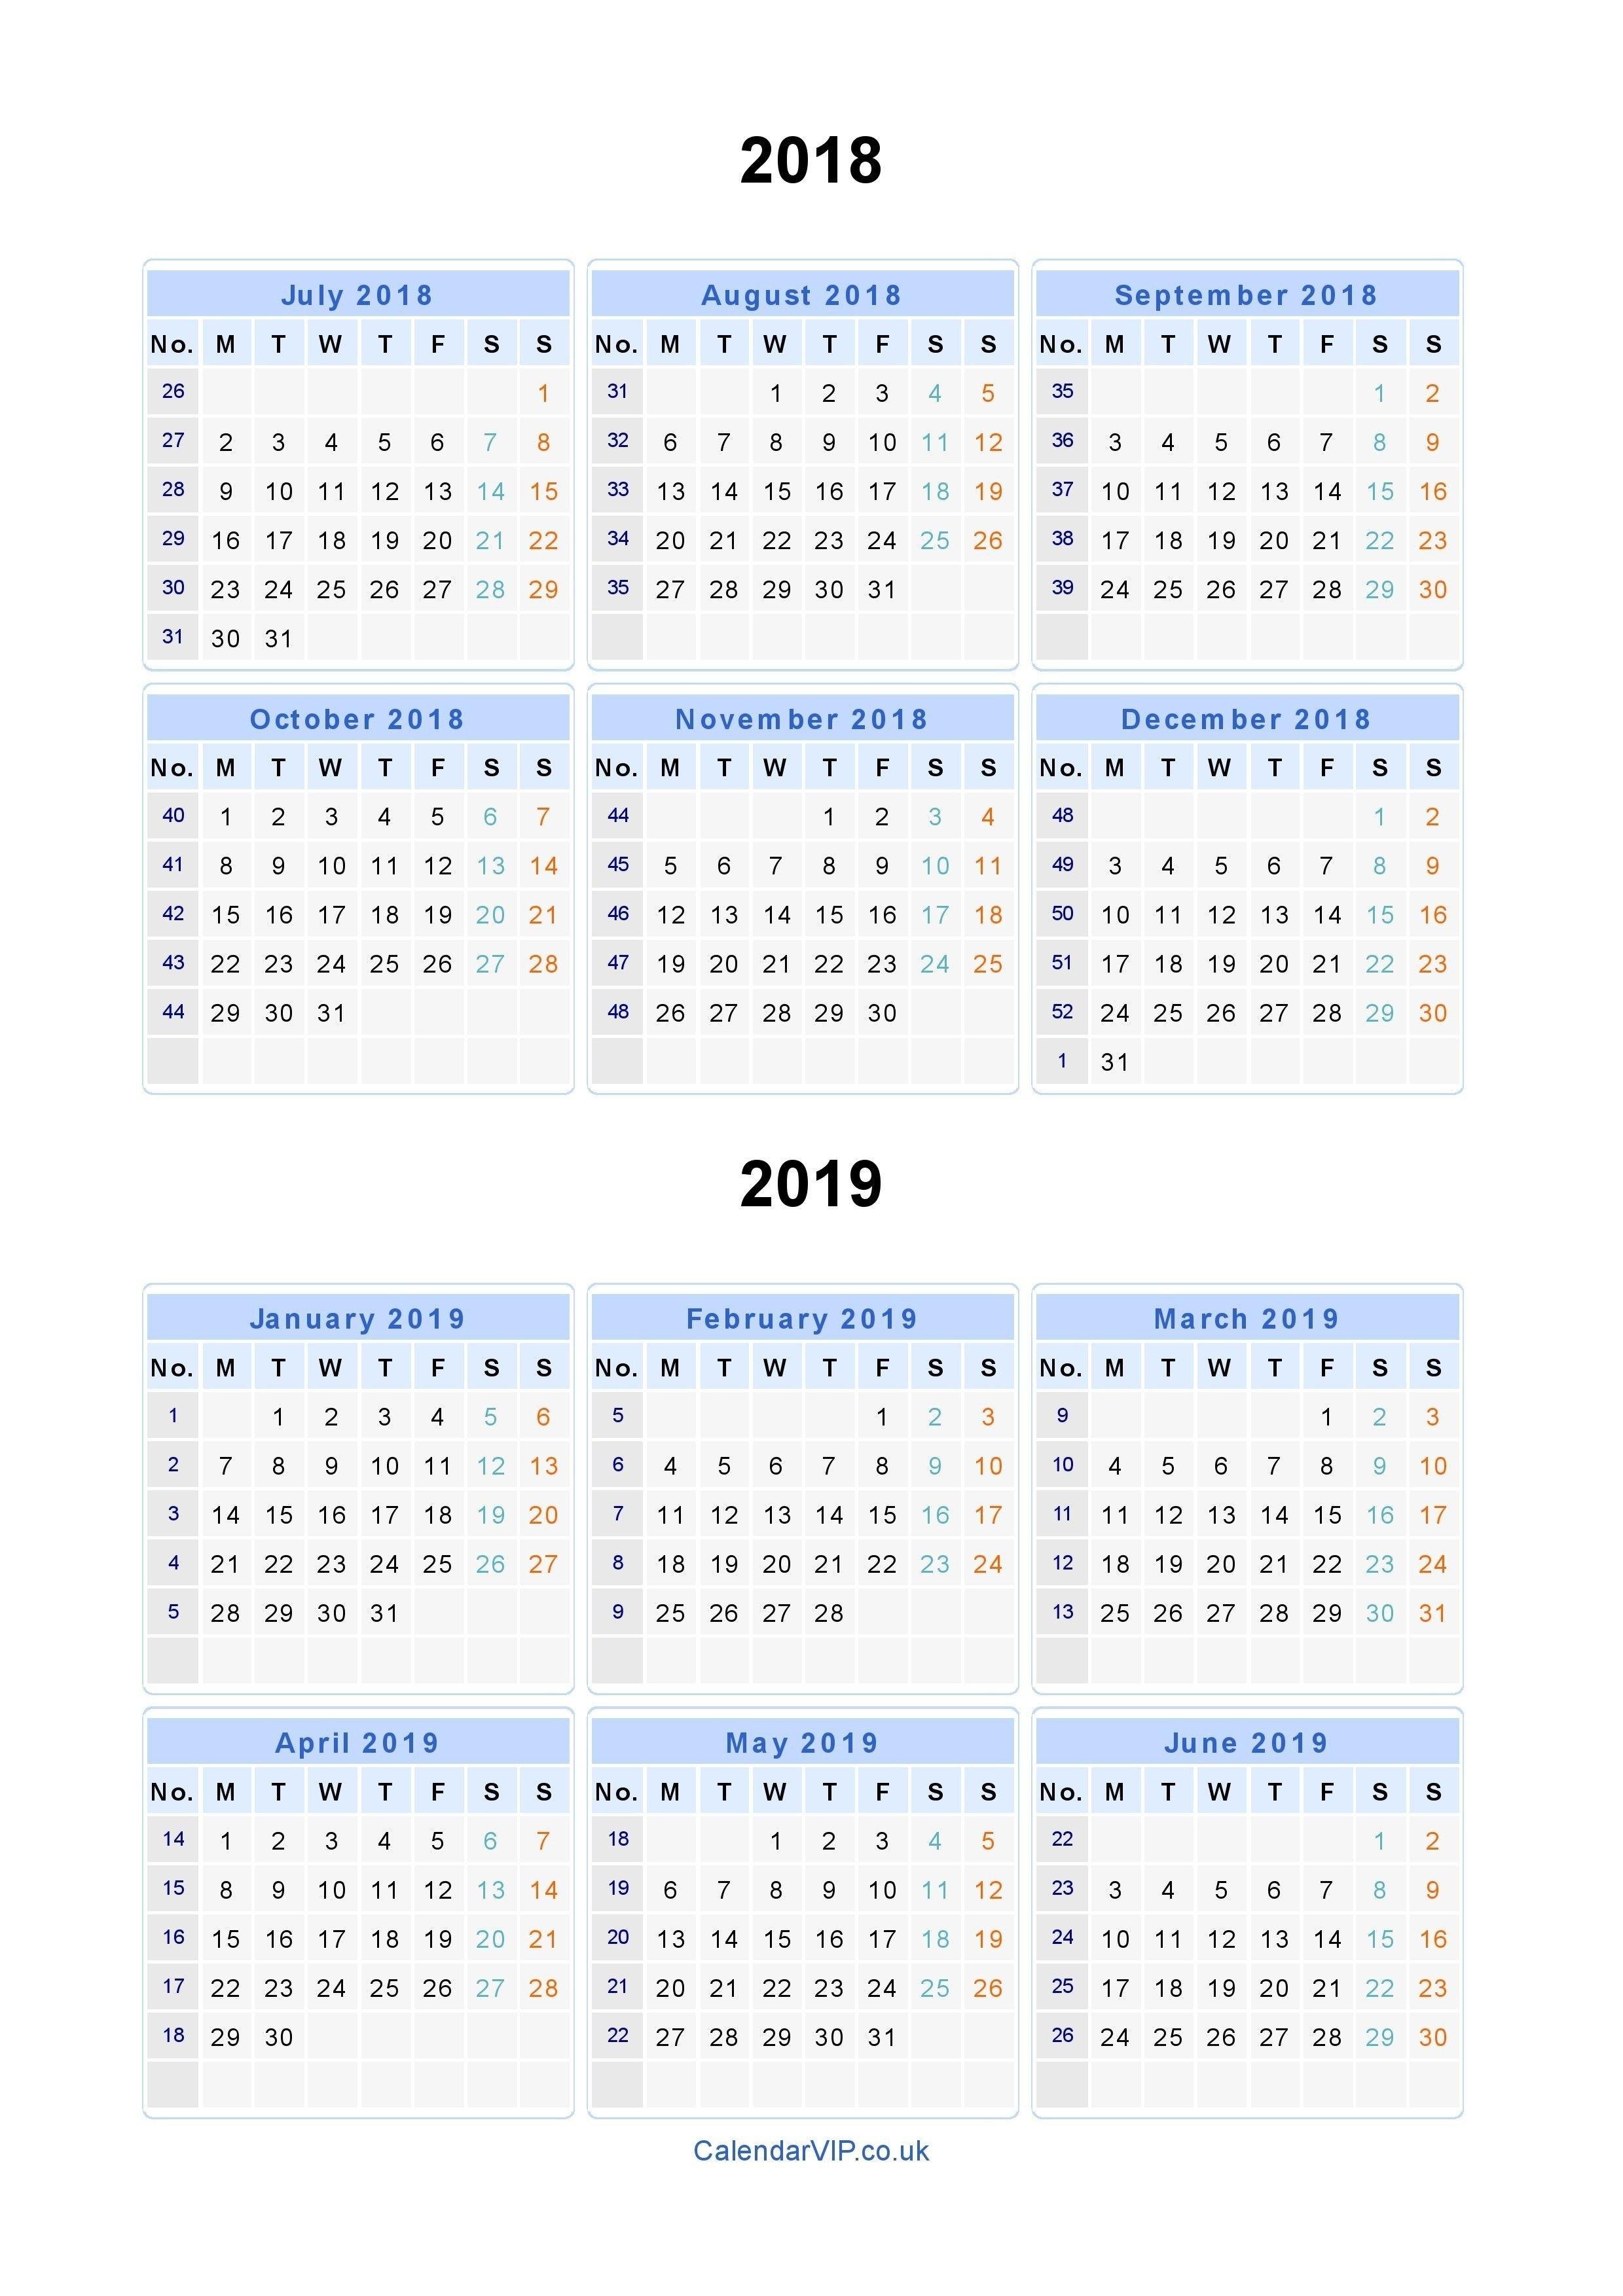 Calendar 2019 Time And Date Free Printable Calendar 2018 Printable Calendar 2019 Date And Time